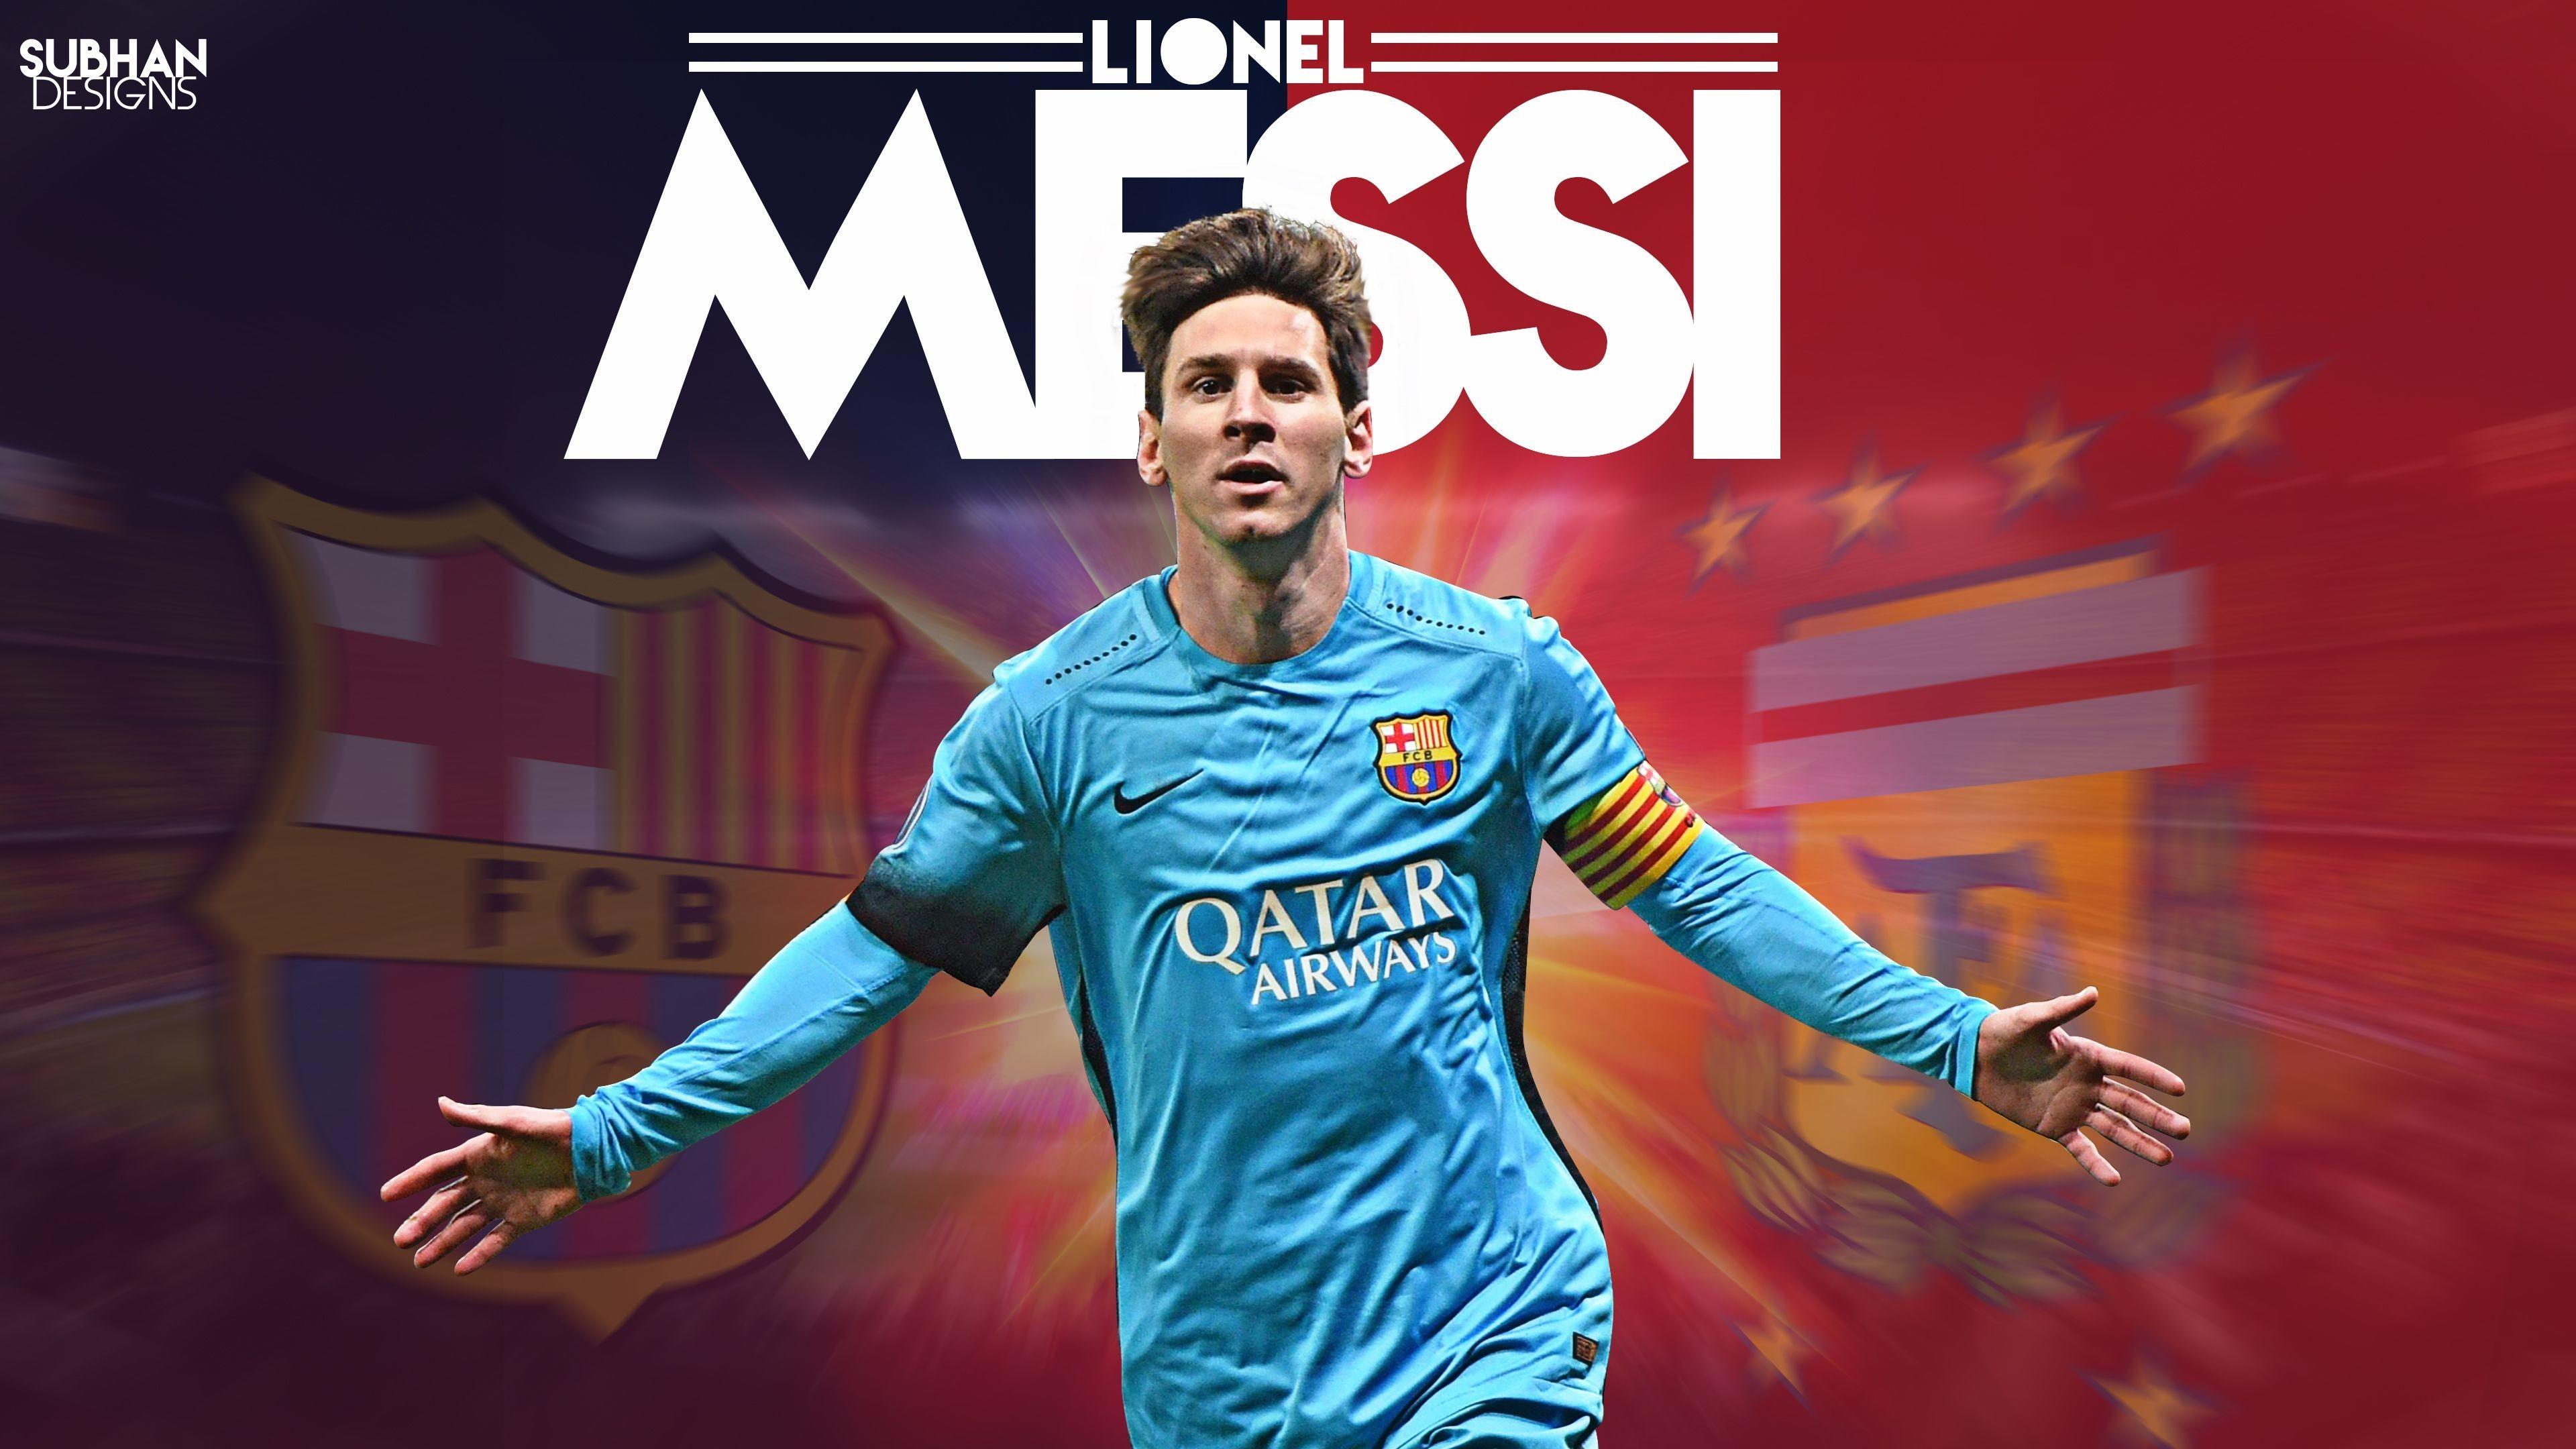 Amazing Fc Barcelona Wallpaper Msn – FC Barcelona Wallpaper HD 2017 DHK7